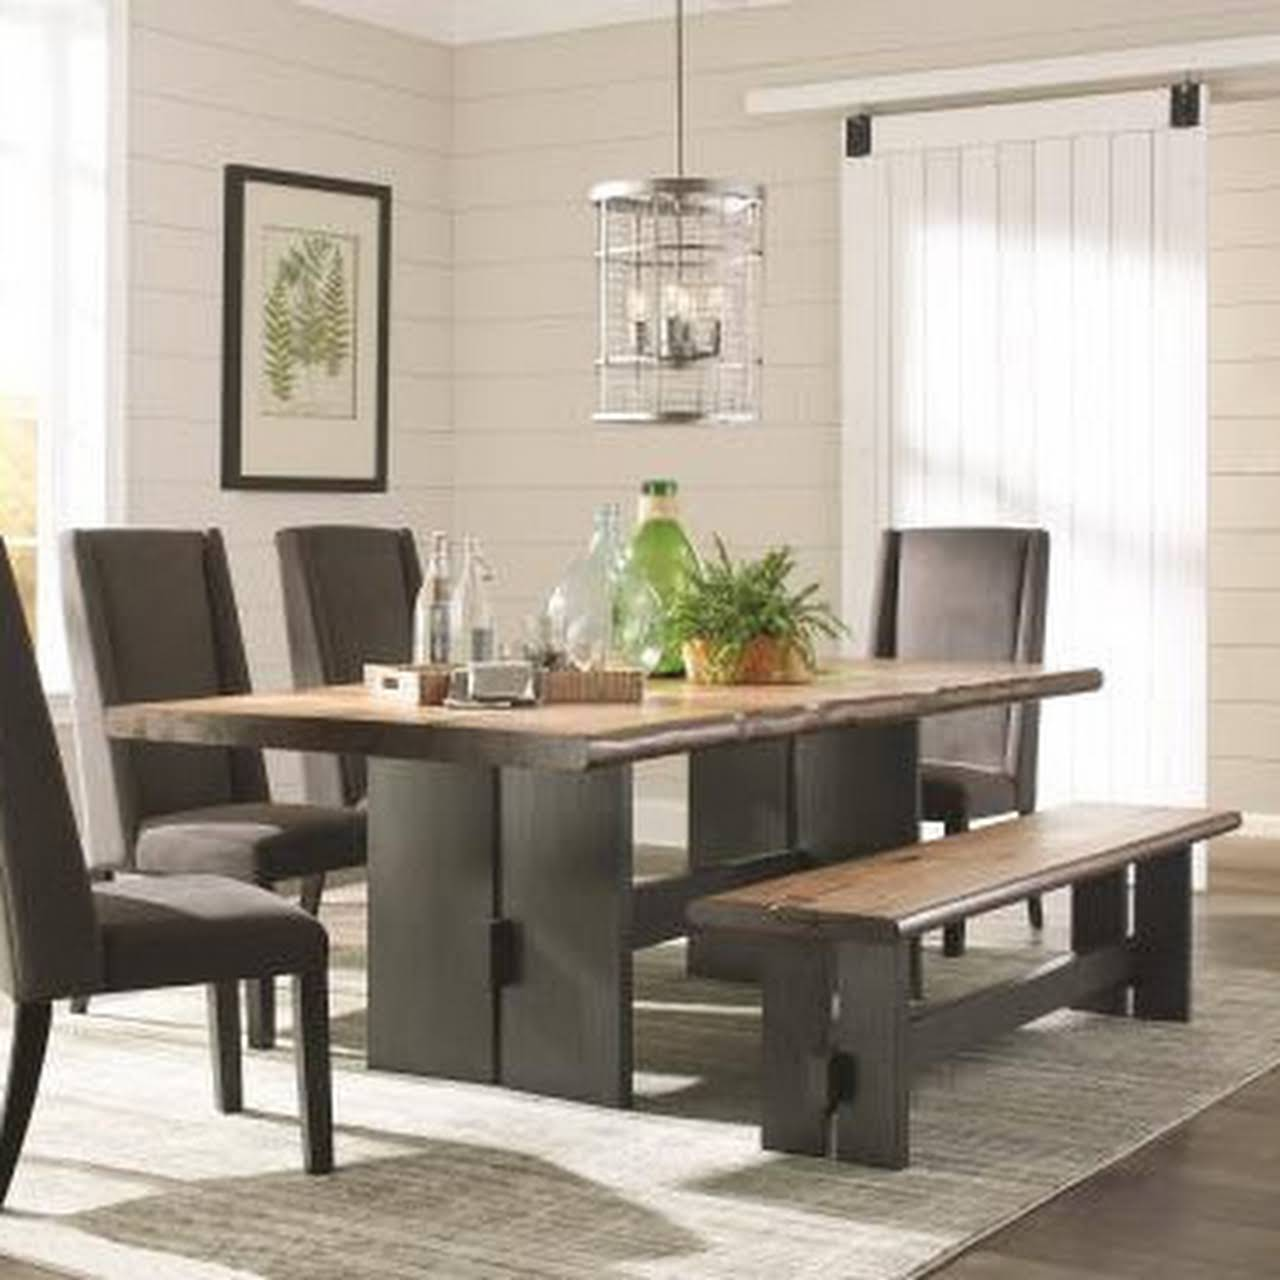 Bedroom and Sofa Discounters - Furniture Store in Rancho Cordova